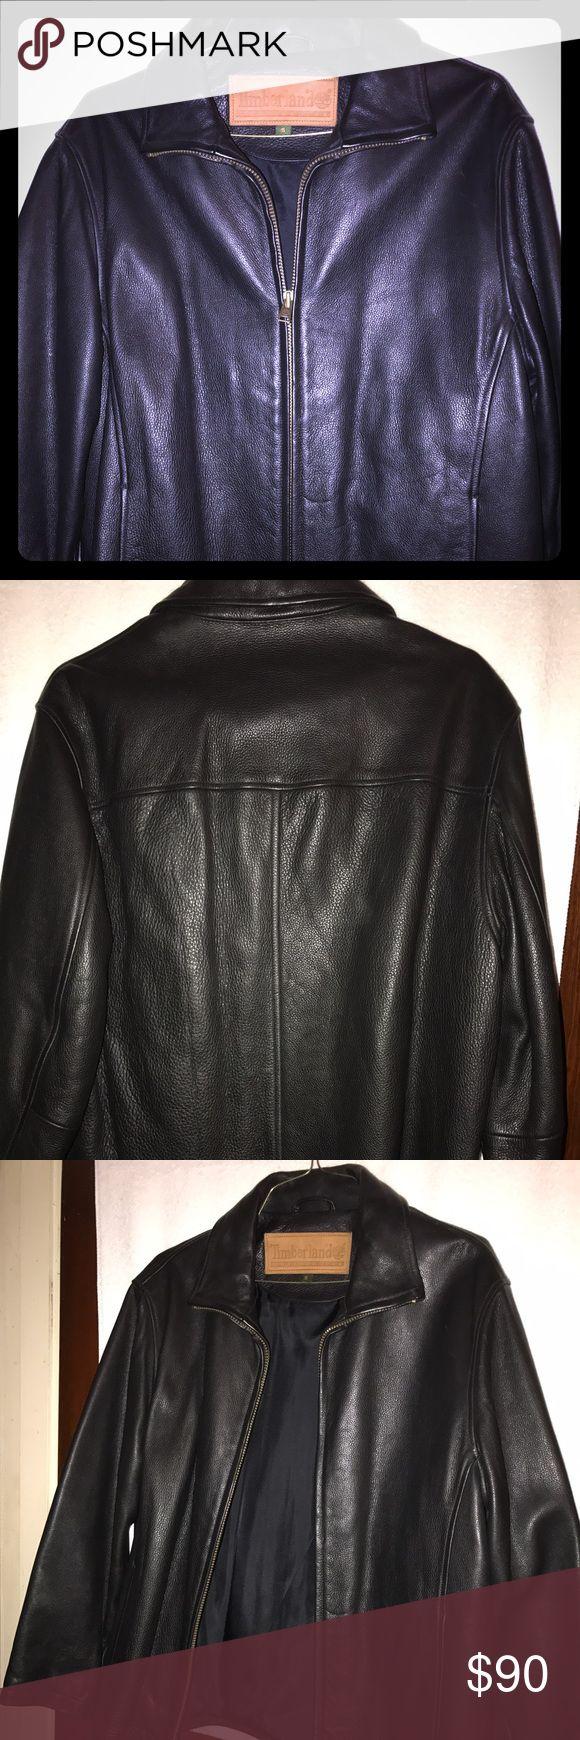 Black Leather Timberland Jacket Size S unisex Super nice Timberland Leather Jacket true to size slightly worn size S men or women will enjoy Timberland Jackets & Coats Performance Jackets